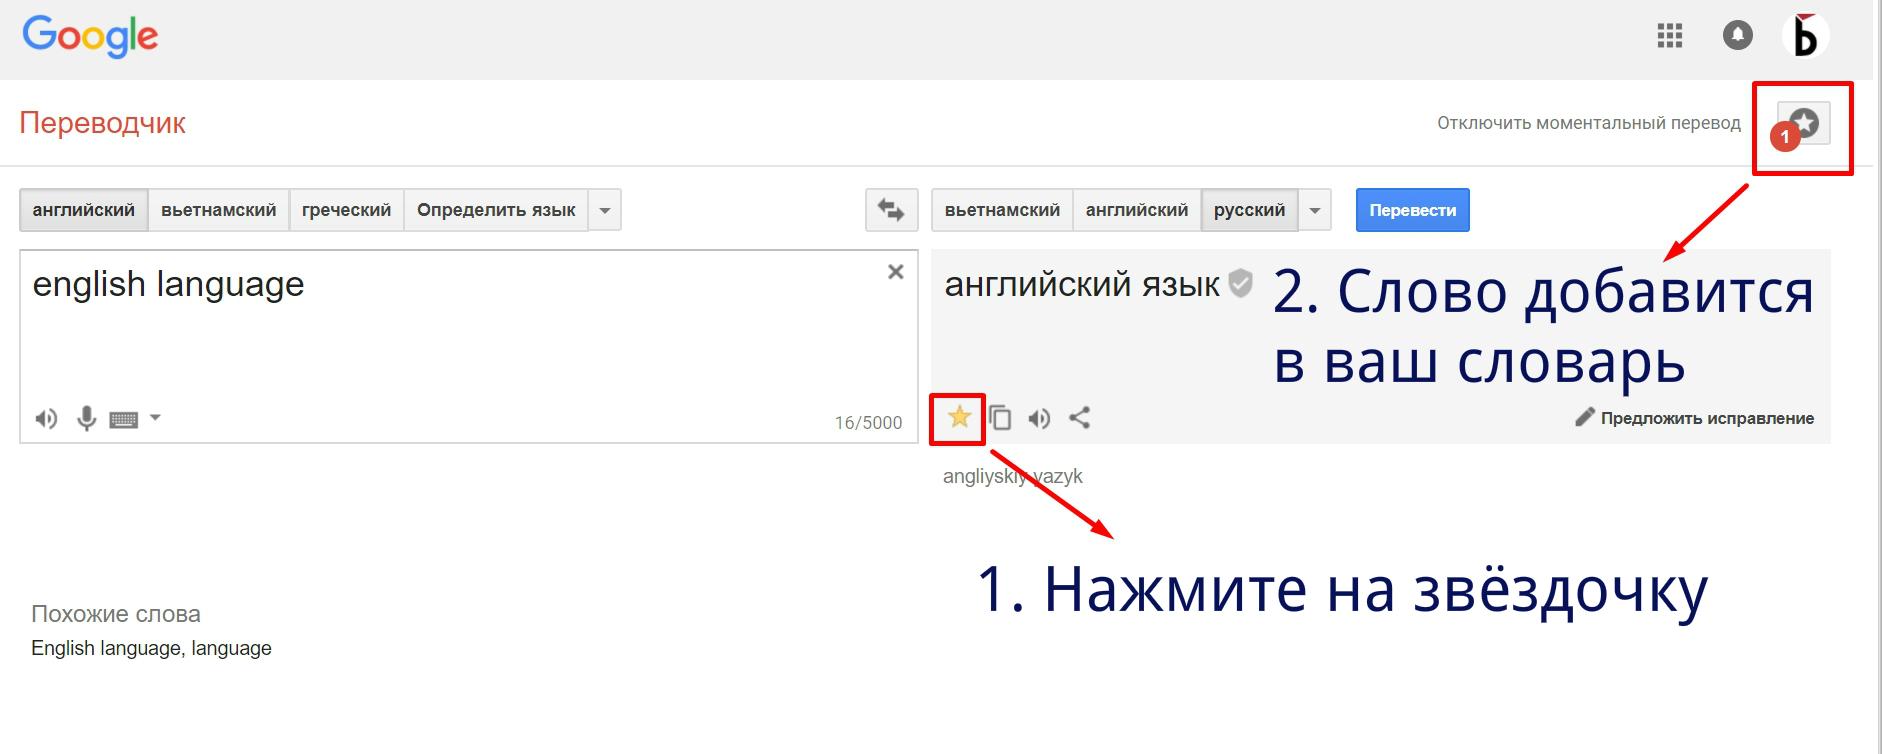 Google переводчик, GoogleTranslate